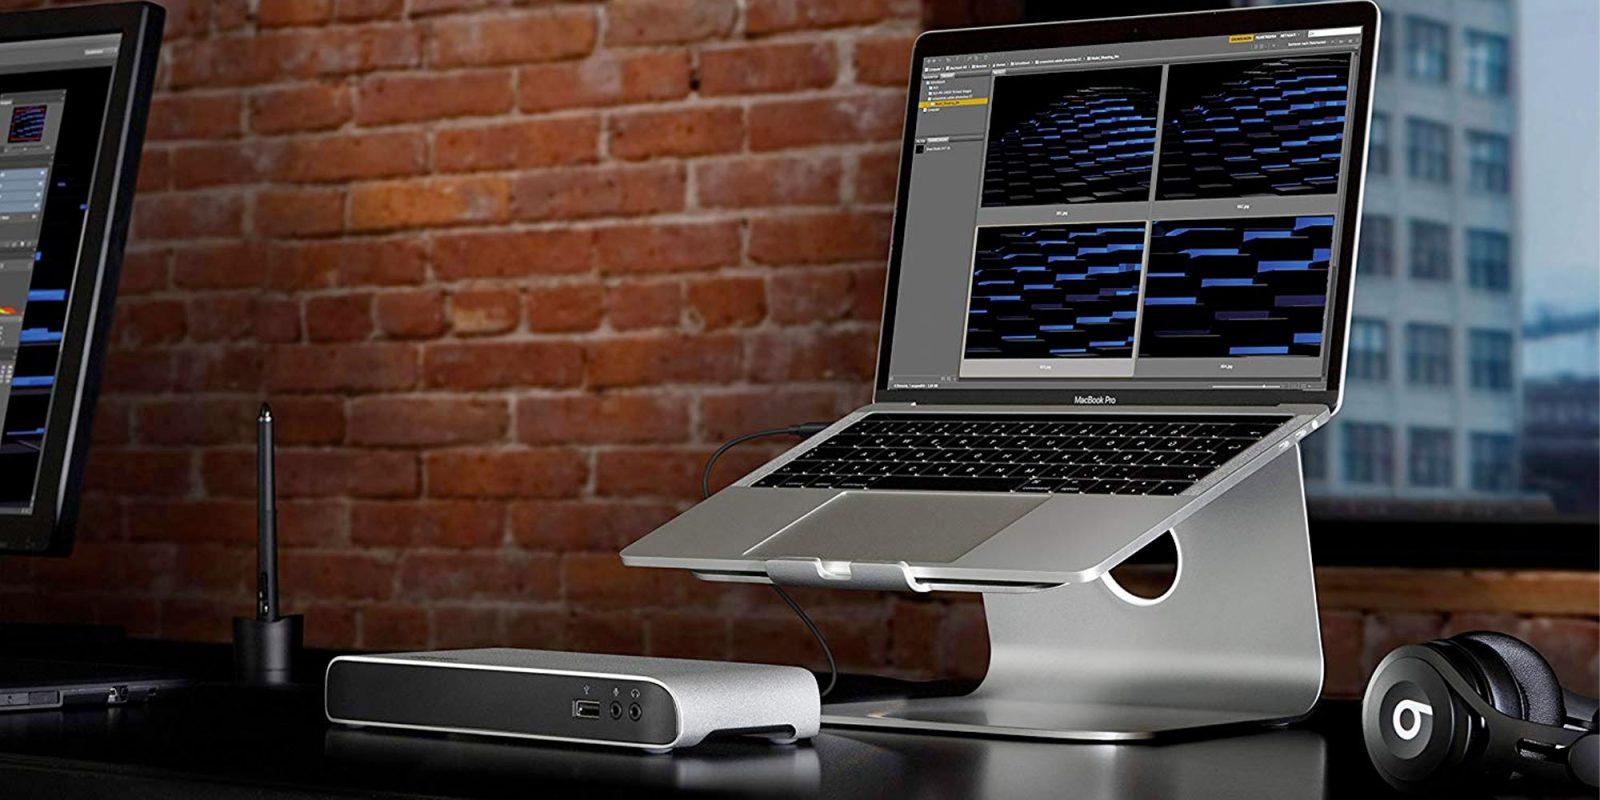 Elgato's Thunderbolt 3 Dock sports USB 3, DisplayPort, more: $210 (15% off)